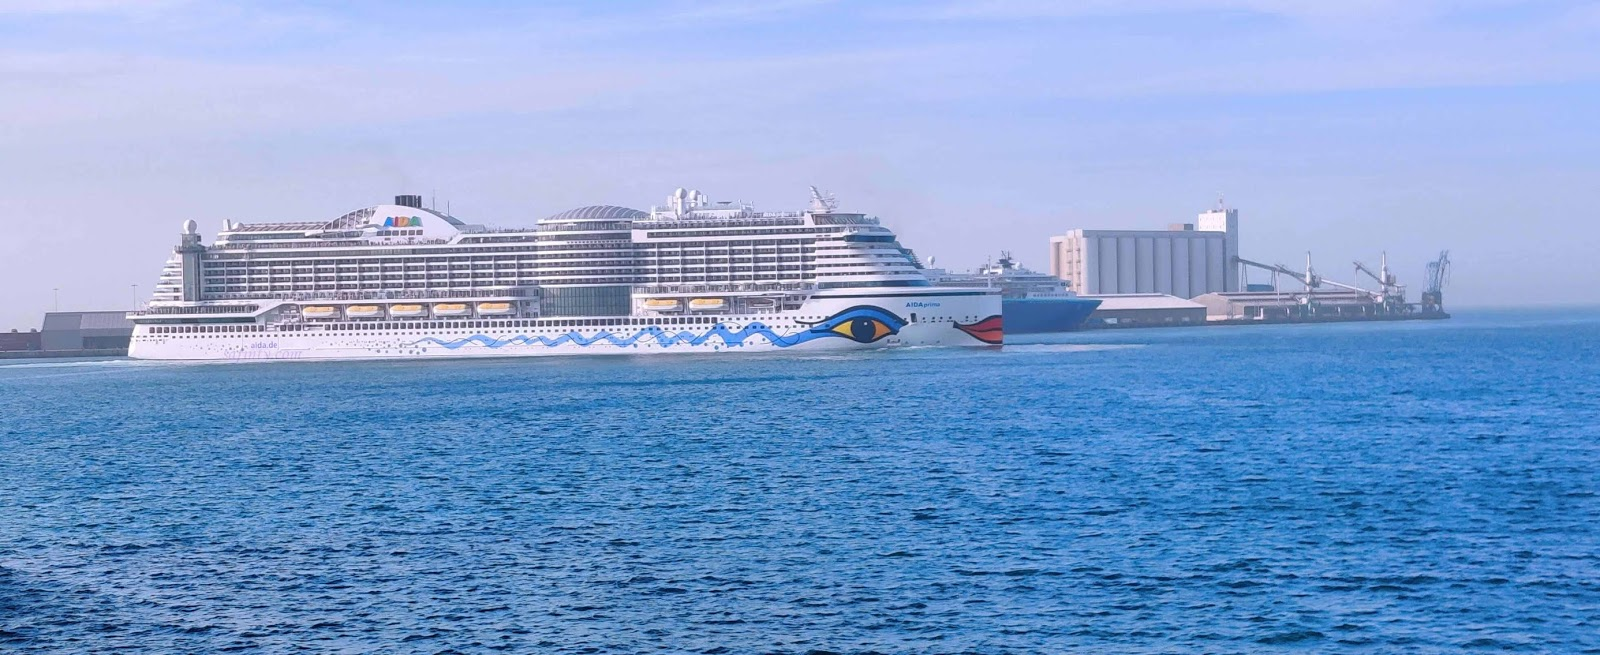 AIDA PRIMA , AIDA , CRUISE VESSEL , سفن سياحية